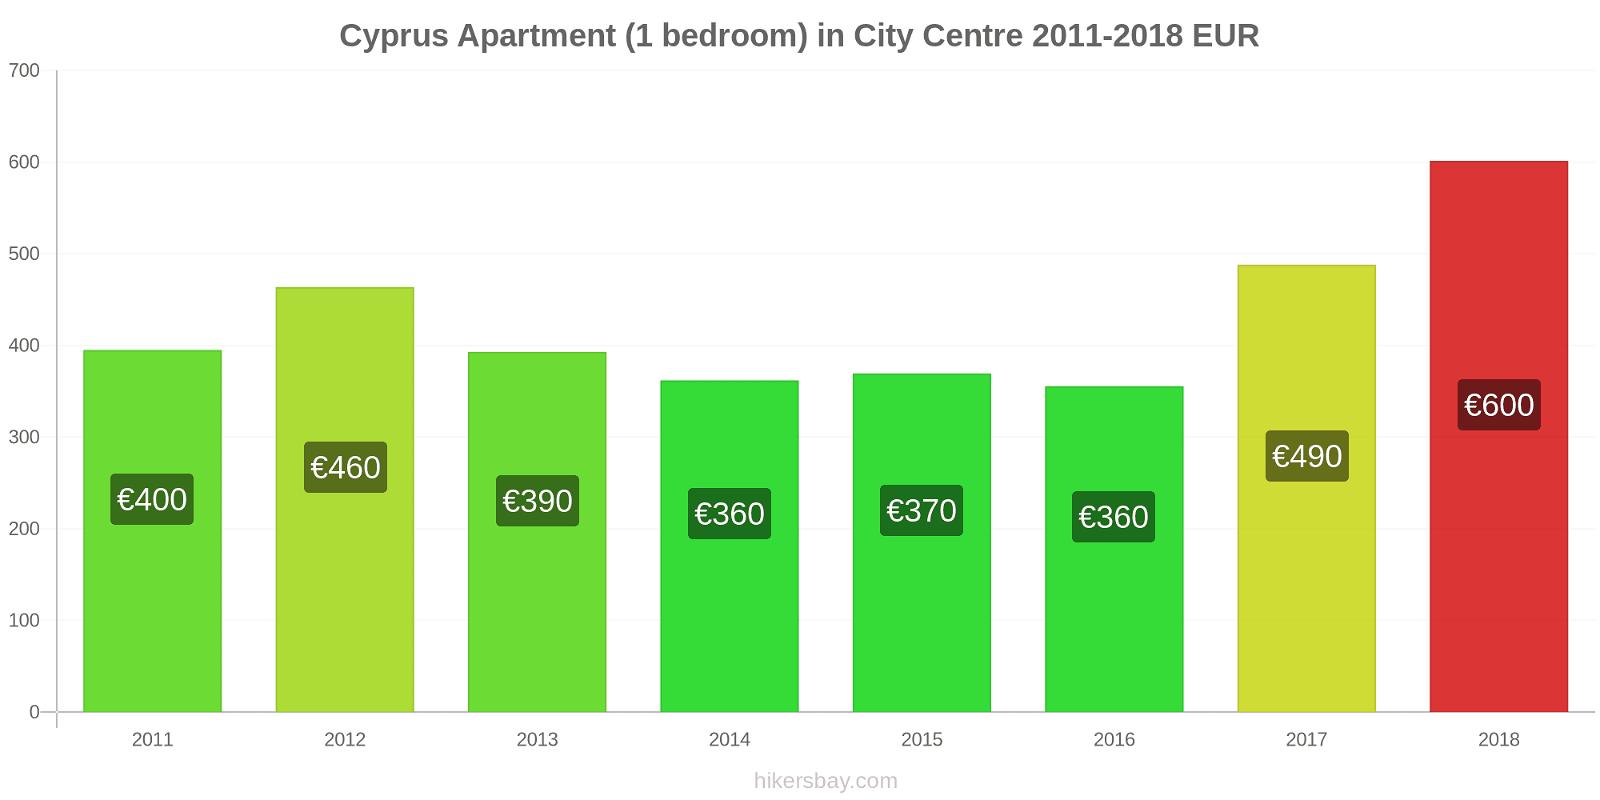 Cyprus price changes Apartment (1 bedroom) in City Centre hikersbay.com